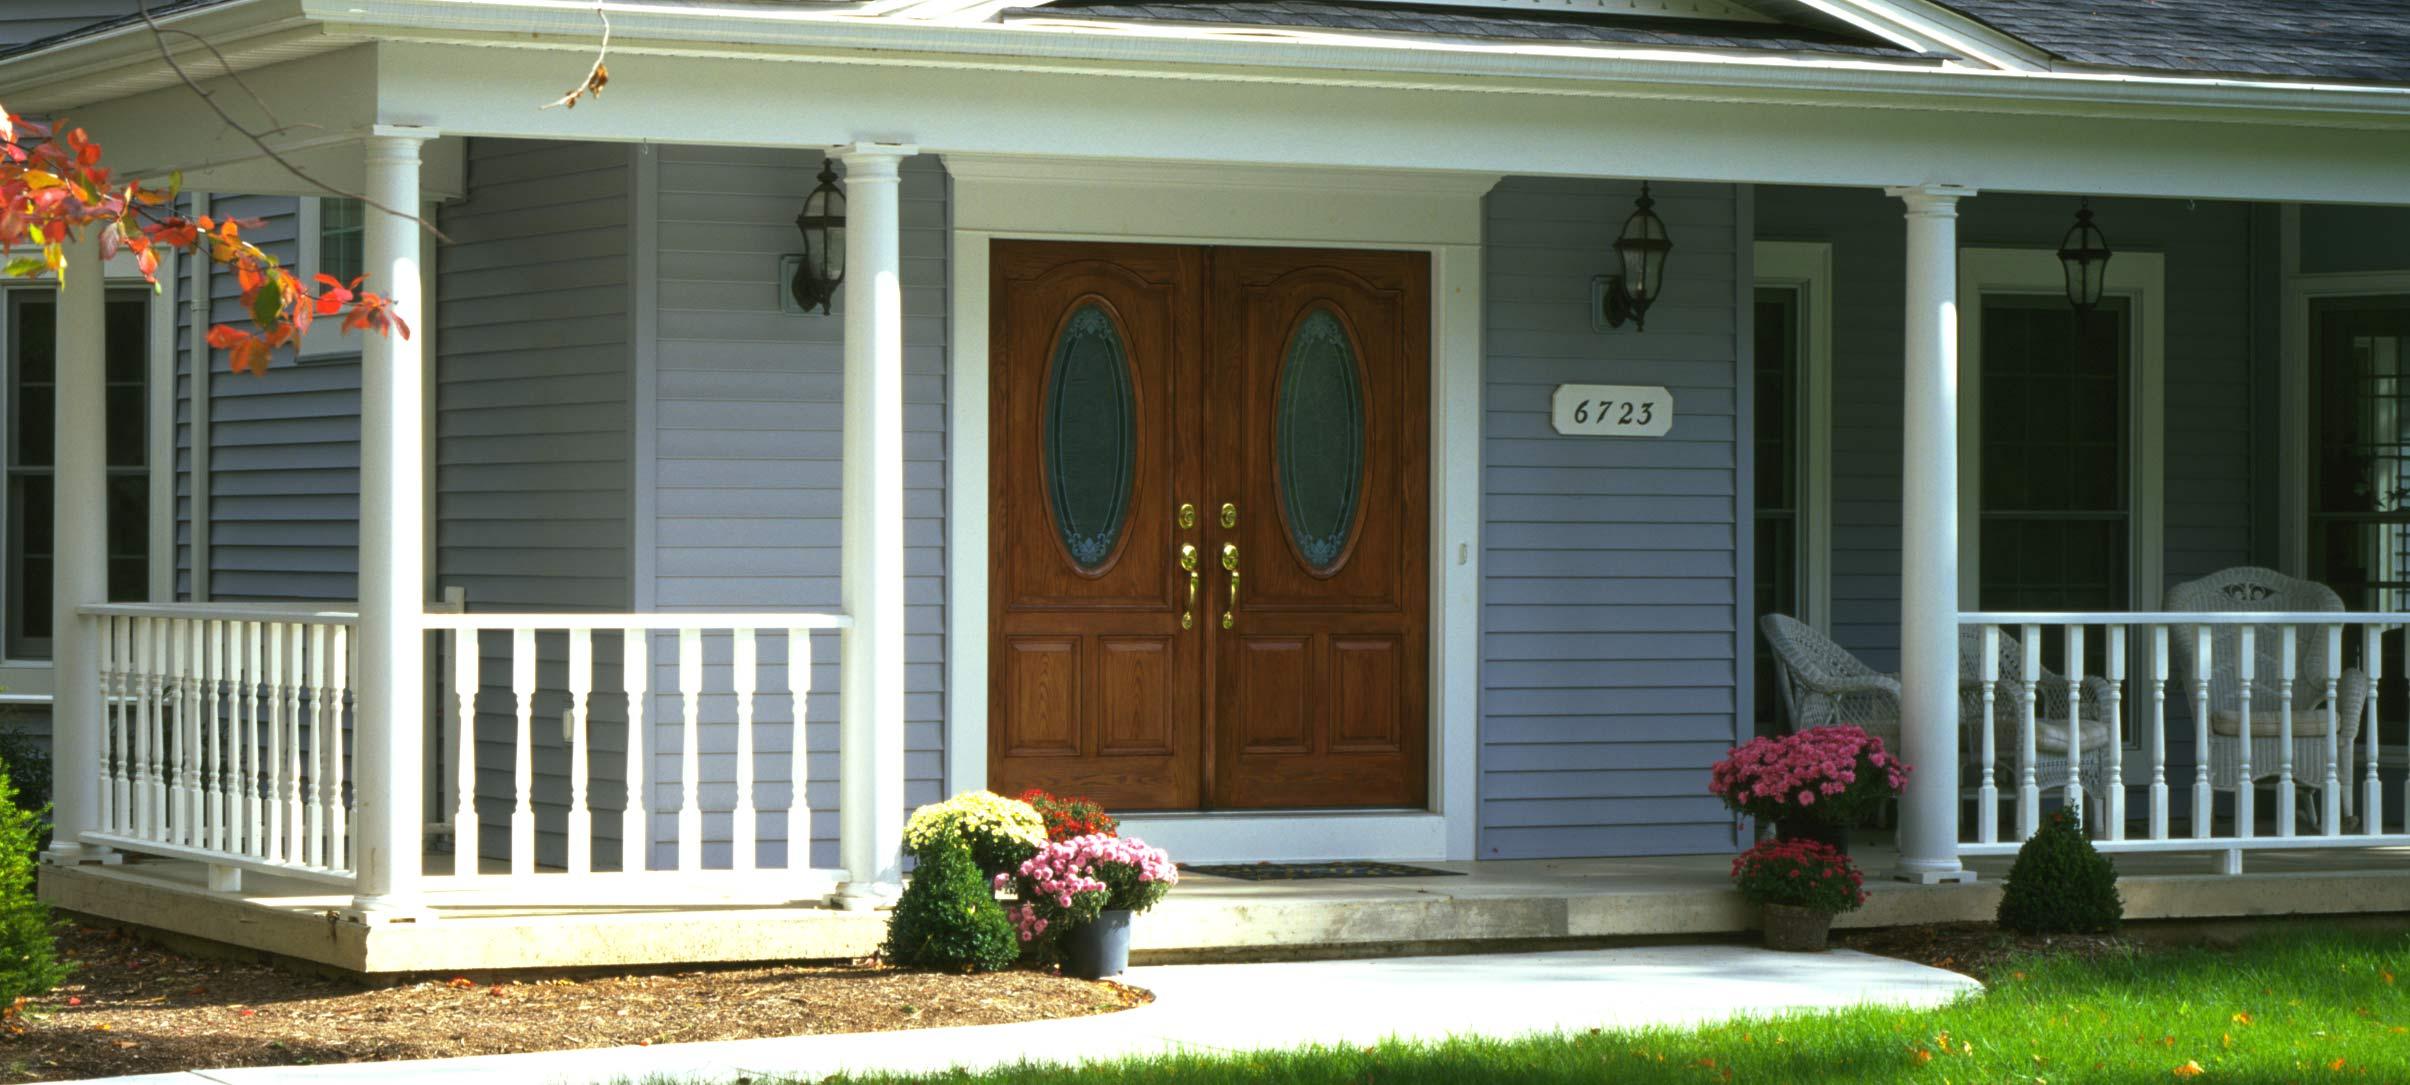 Blog Az Valley Windows Window And Door Company